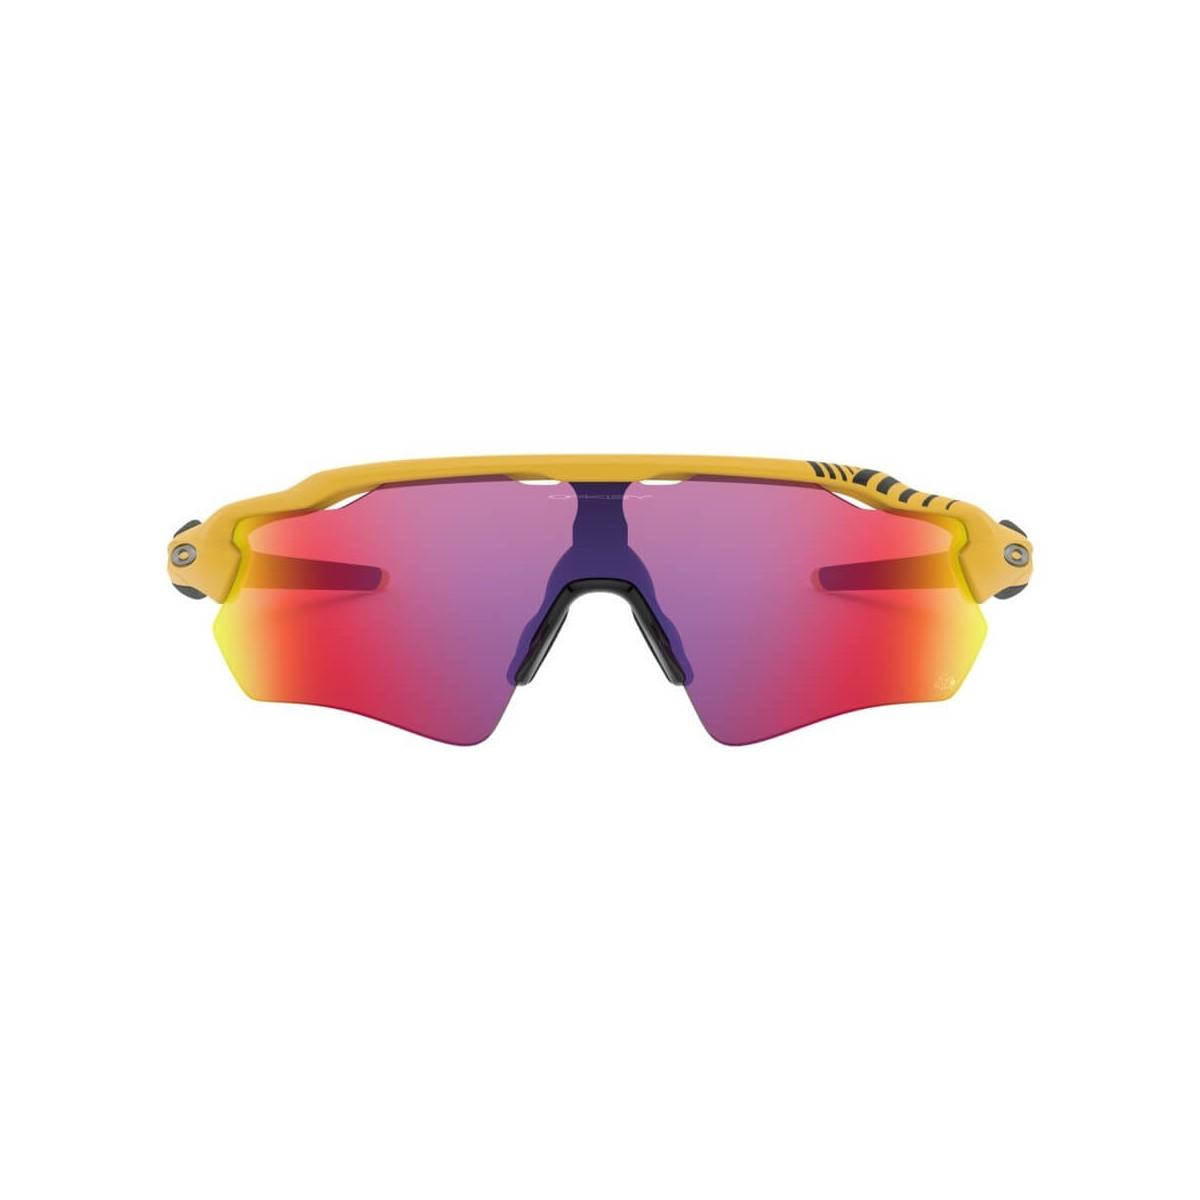 21cb22017 ... Gafas Running Oakley Radar EV Path -Tour de France Collection- Matte  Yellow Prizm Road ...